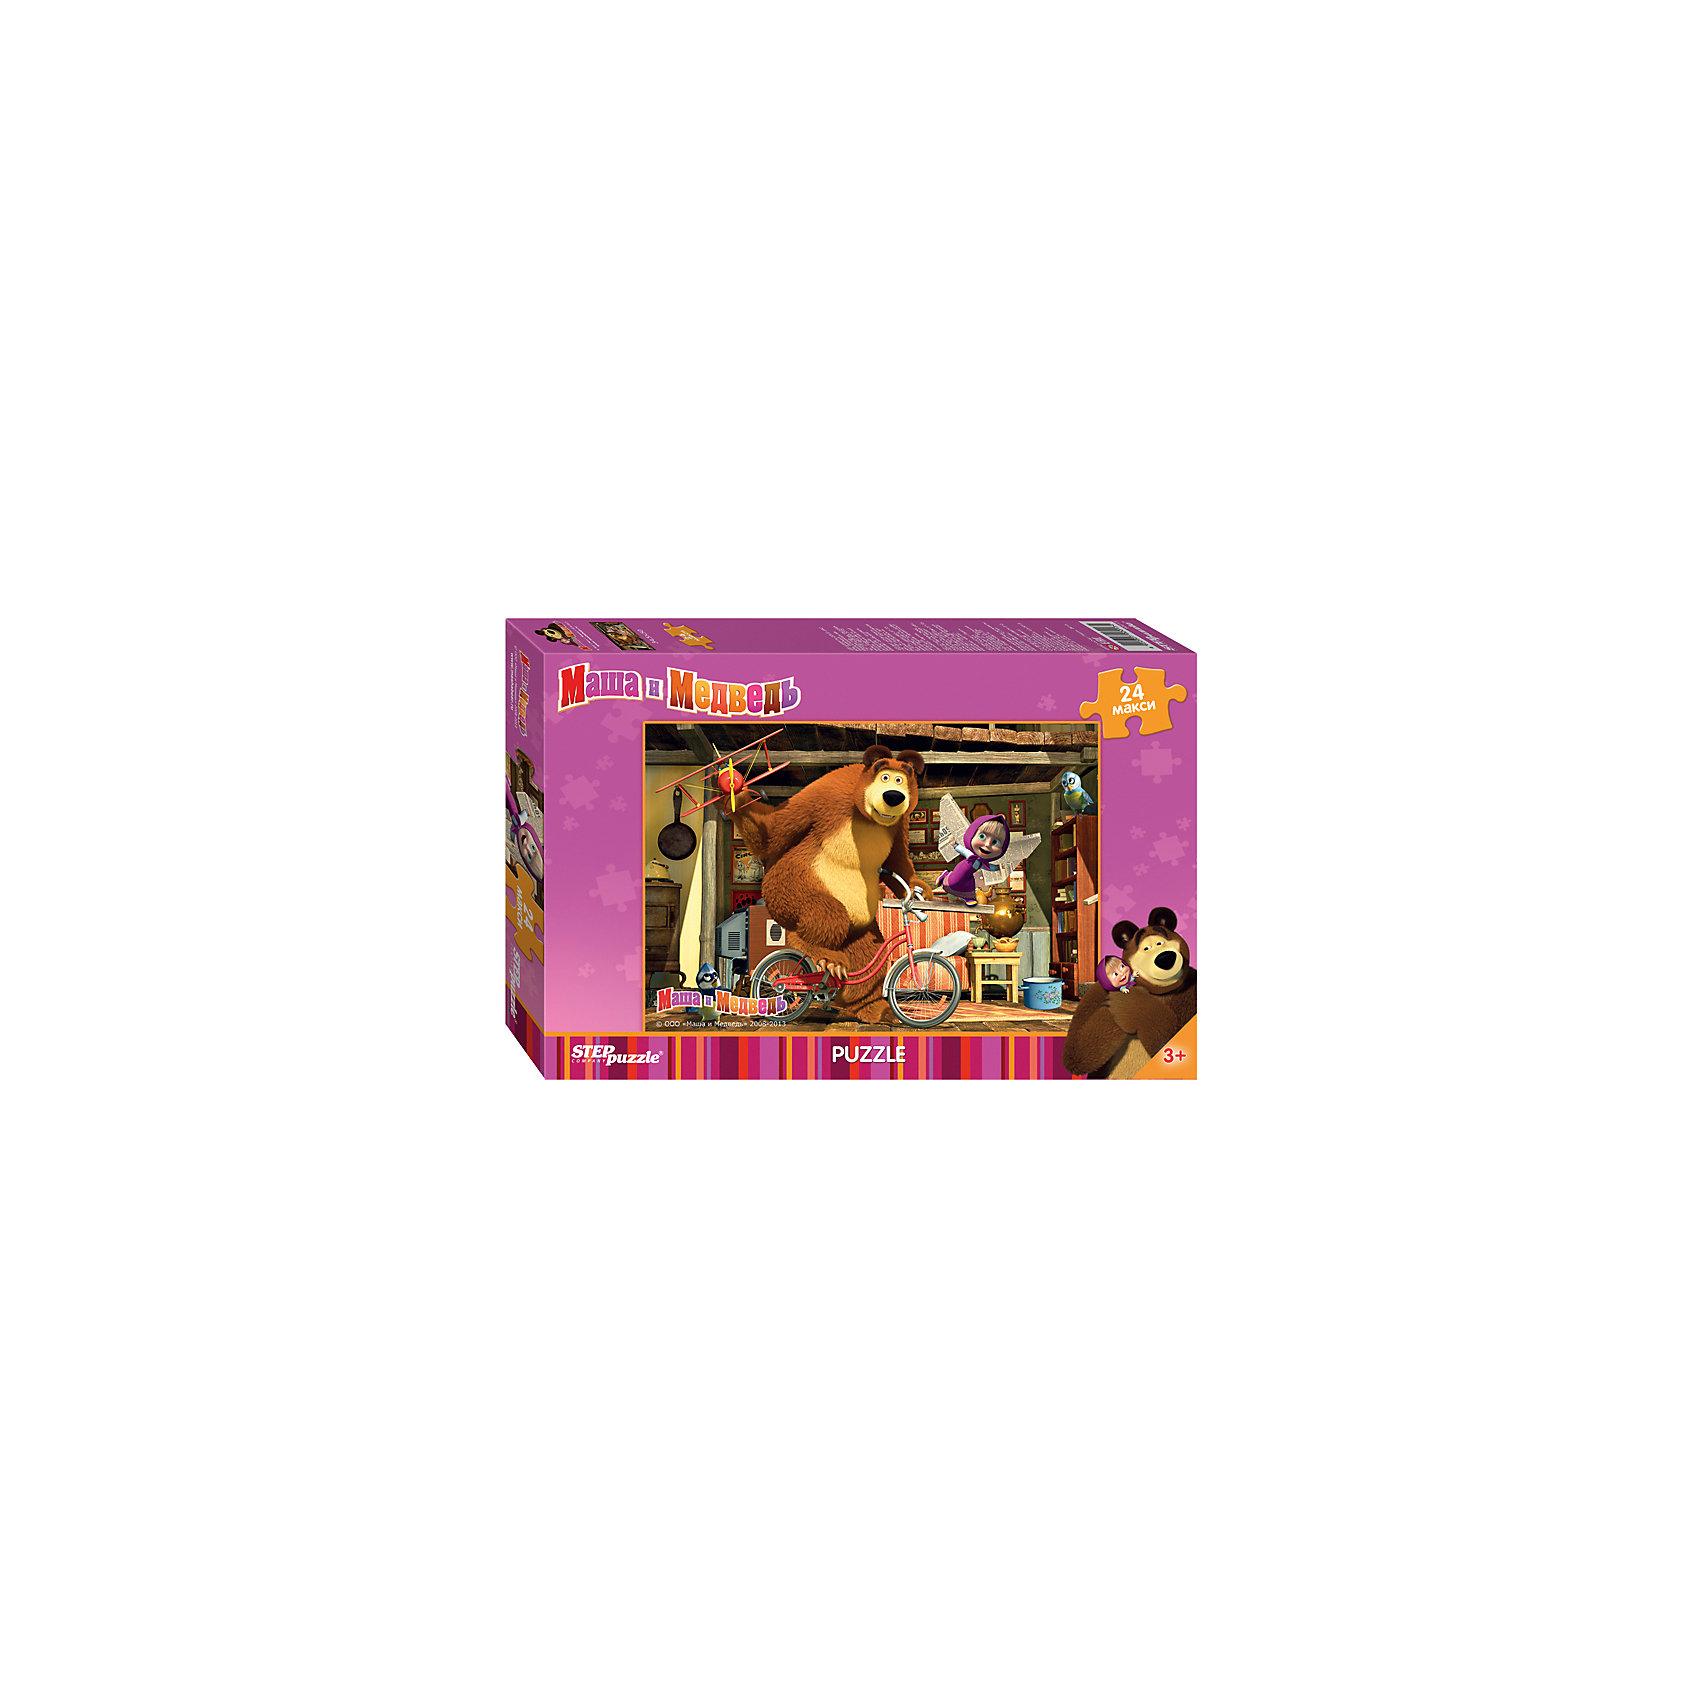 Степ Пазл Пазл Маша и Медведь, 24 MAXI детали, Step Puzzle магниты маша и медведь купить игрушку